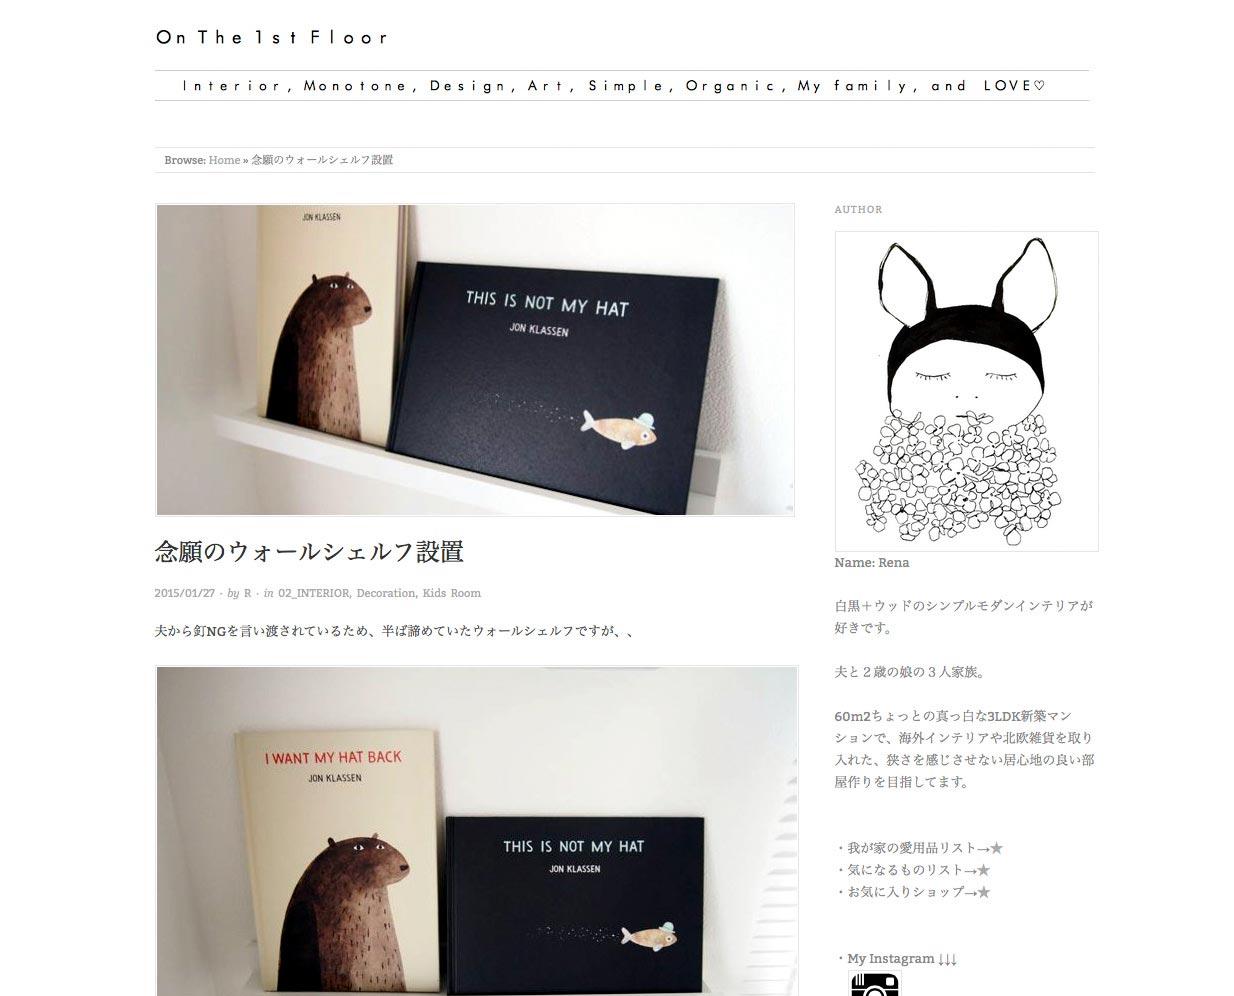 http://1st.flier.jp/?p=2794